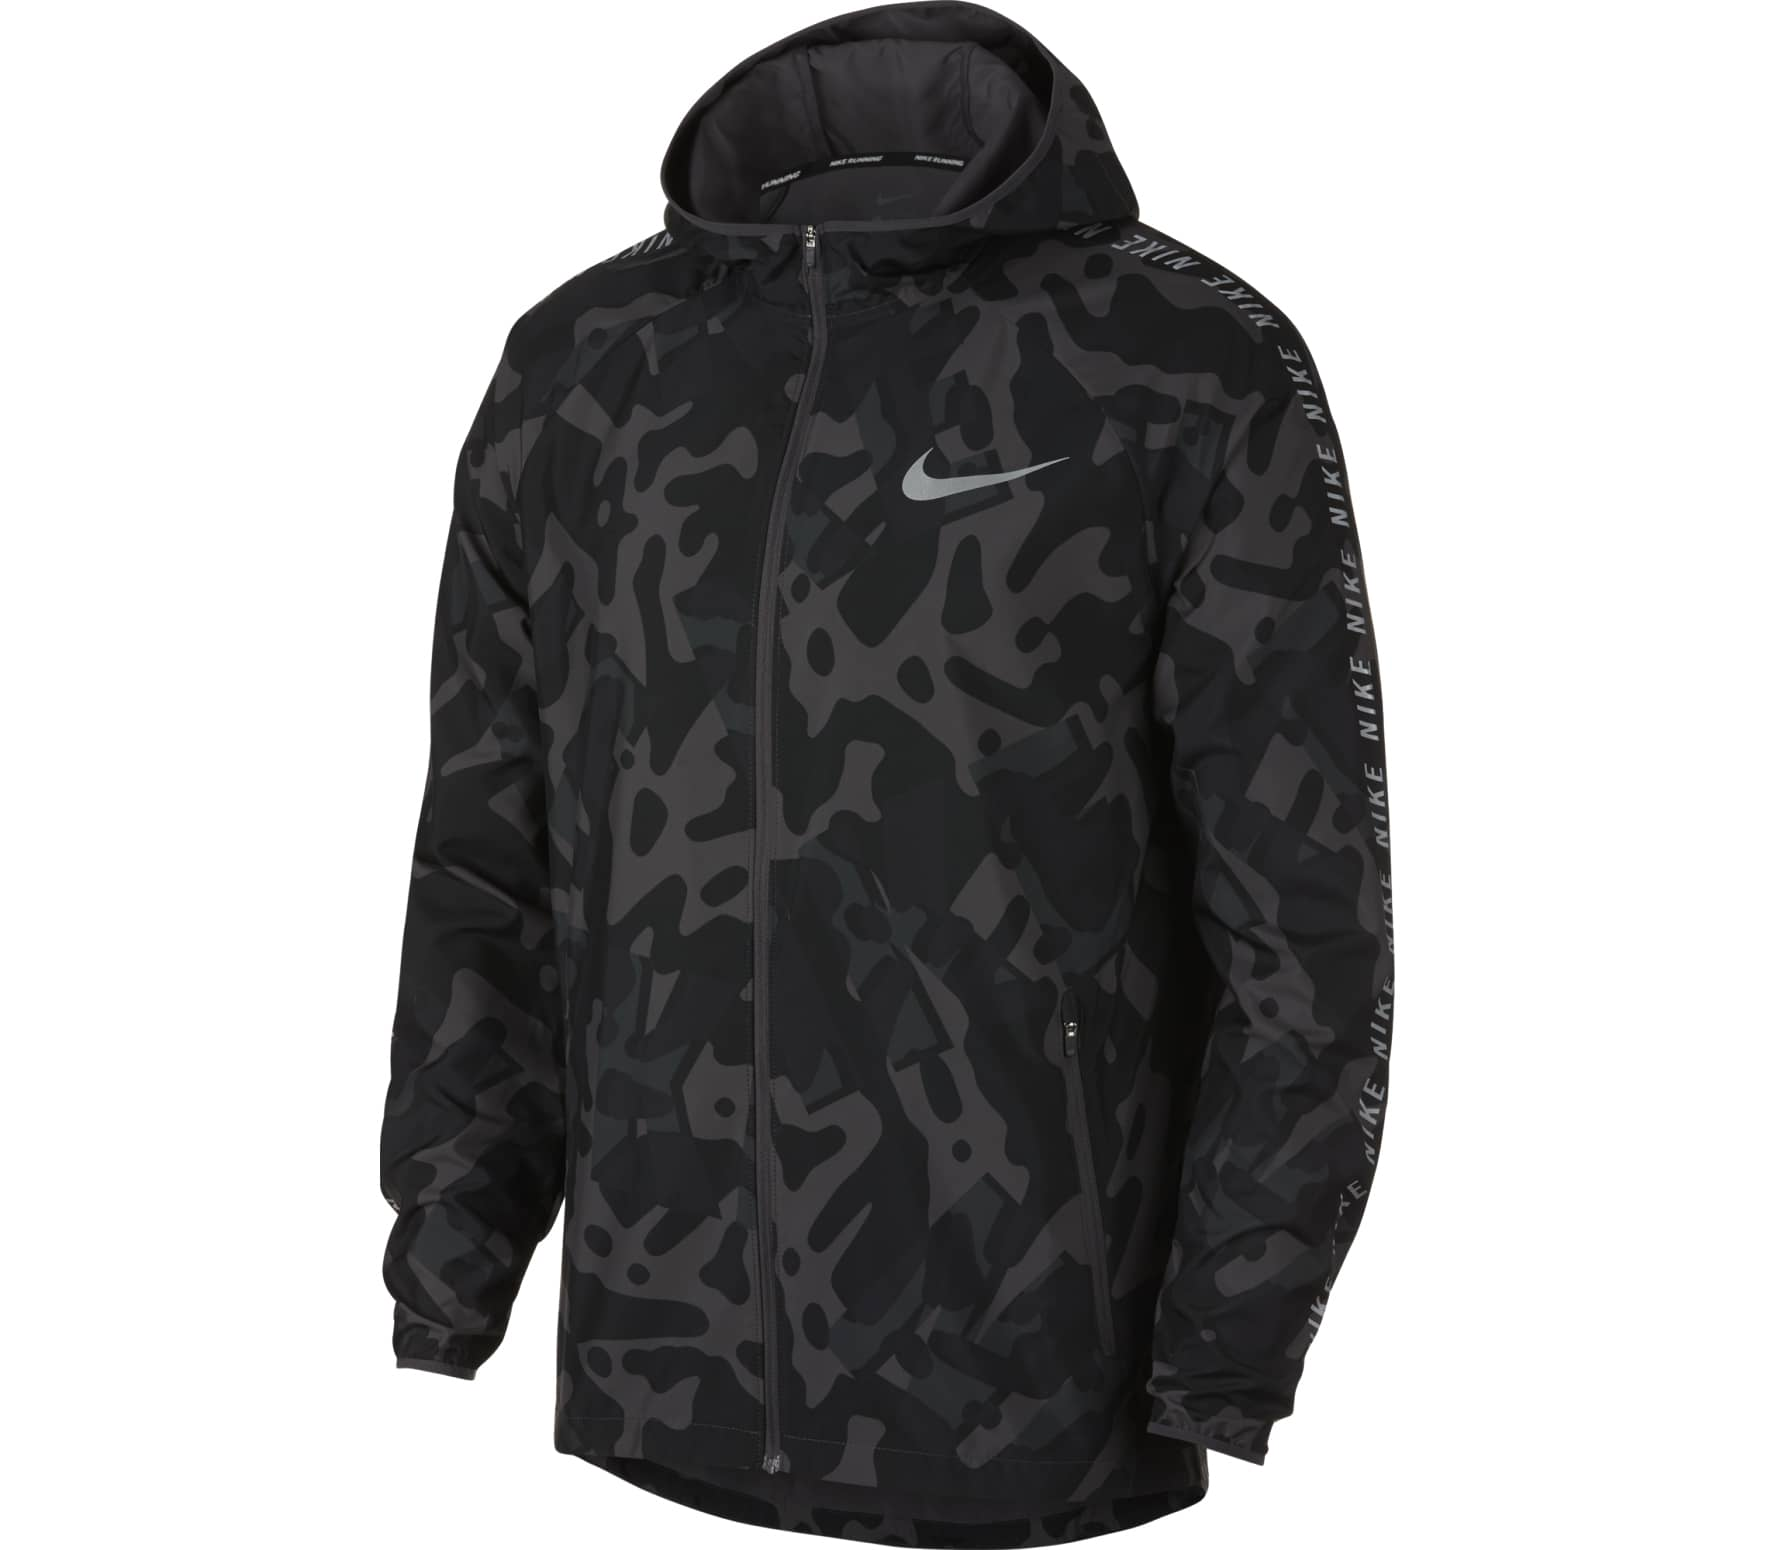 Zwart grijze camouflage heren sportjack Nike Essentials - 929423 010